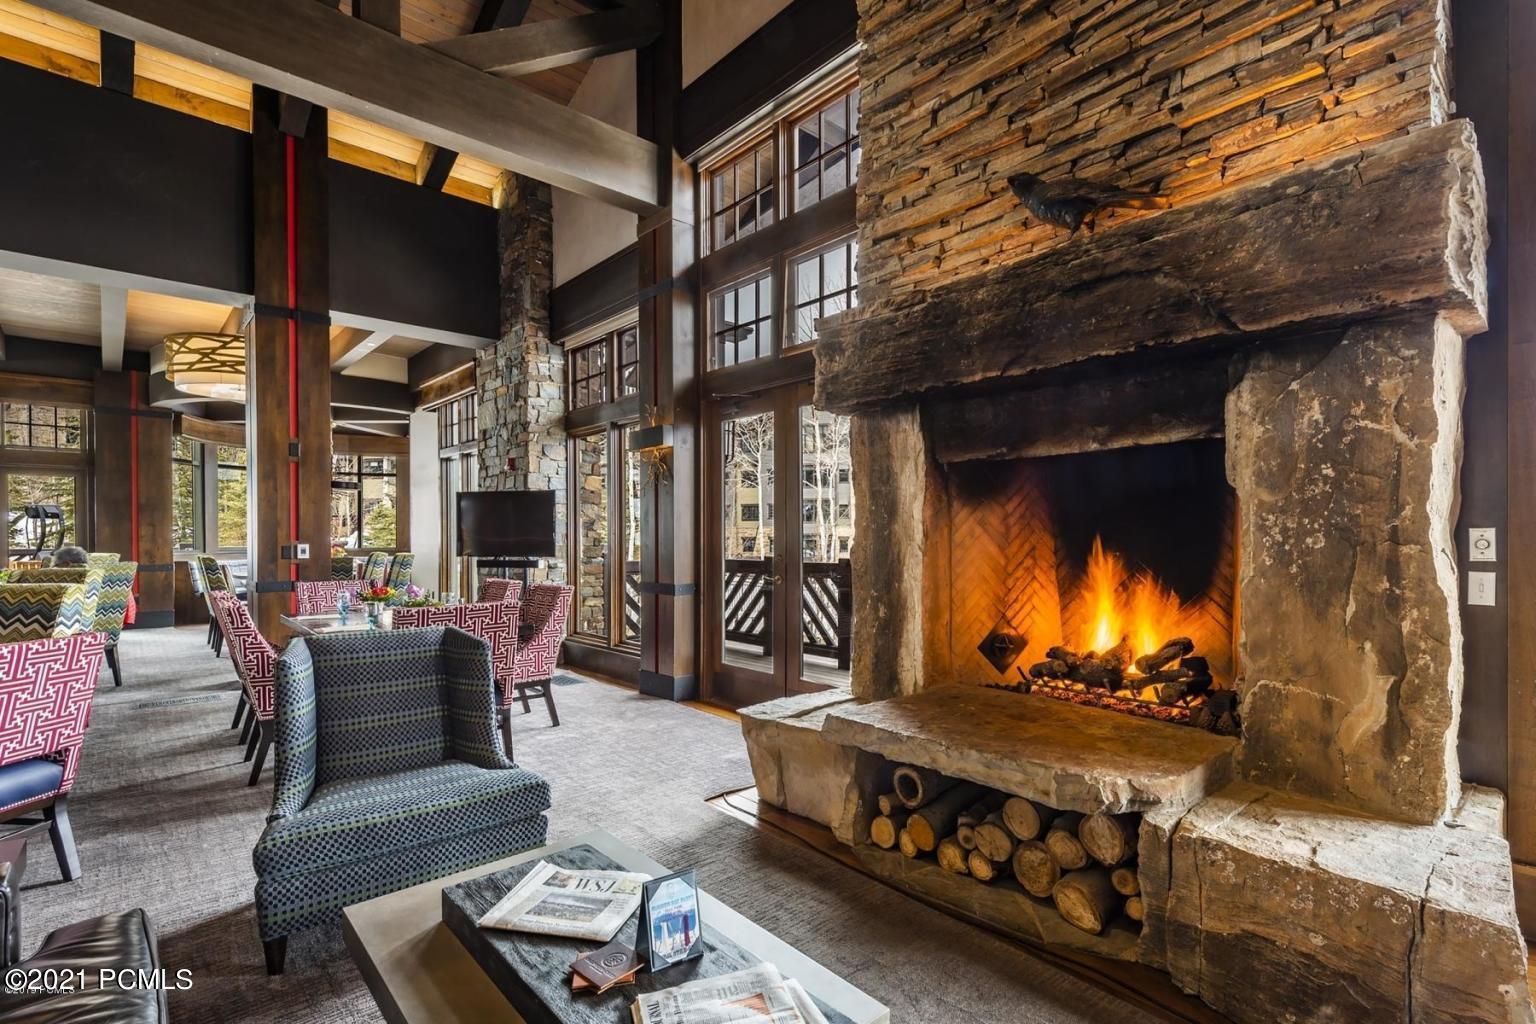 4027 Coopers Hawk Loop, Heber City, Utah 84032, 3 Bedrooms Bedrooms, ,4 BathroomsBathrooms,Single Family,For Sale,Coopers Hawk,12100614